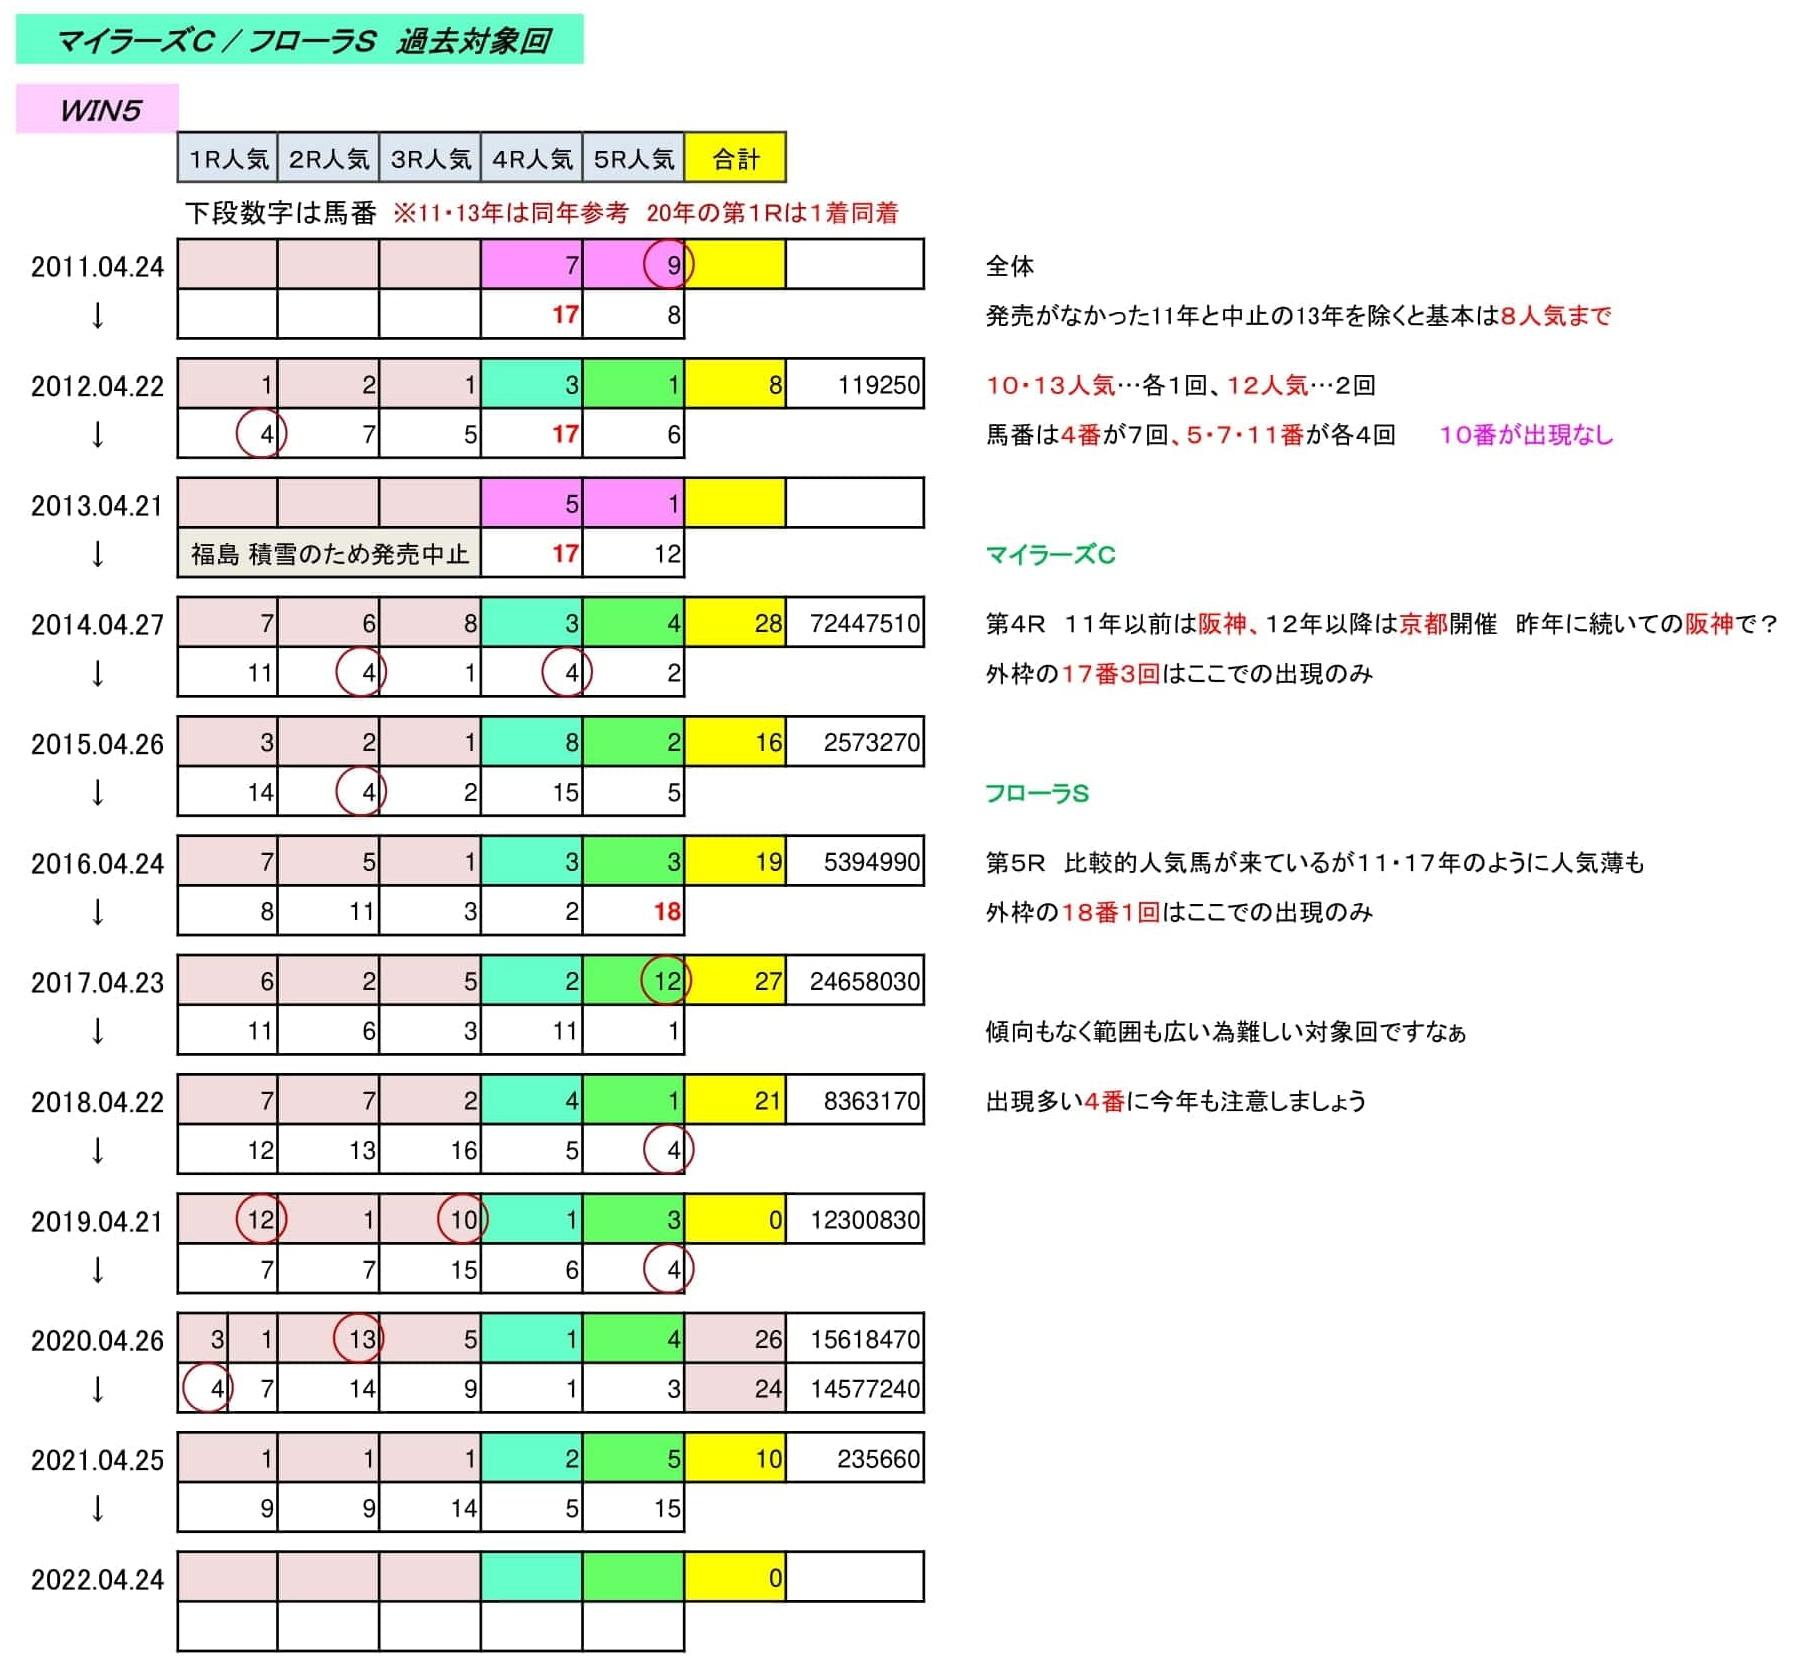 4_24_win5a.jpg